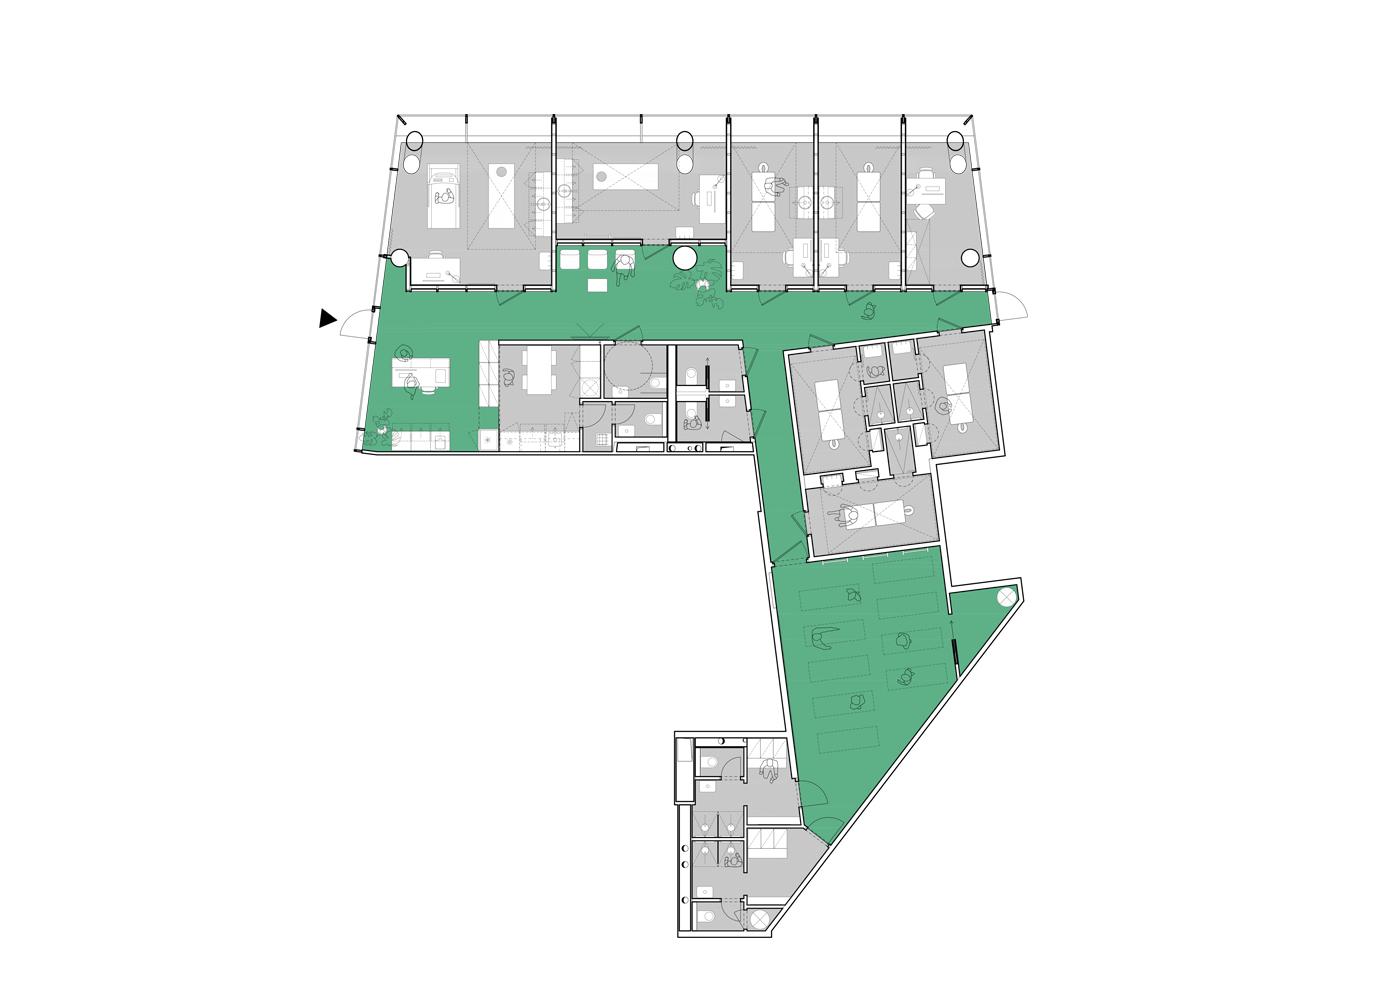 noiz-architekti-fyzio-centrum-11